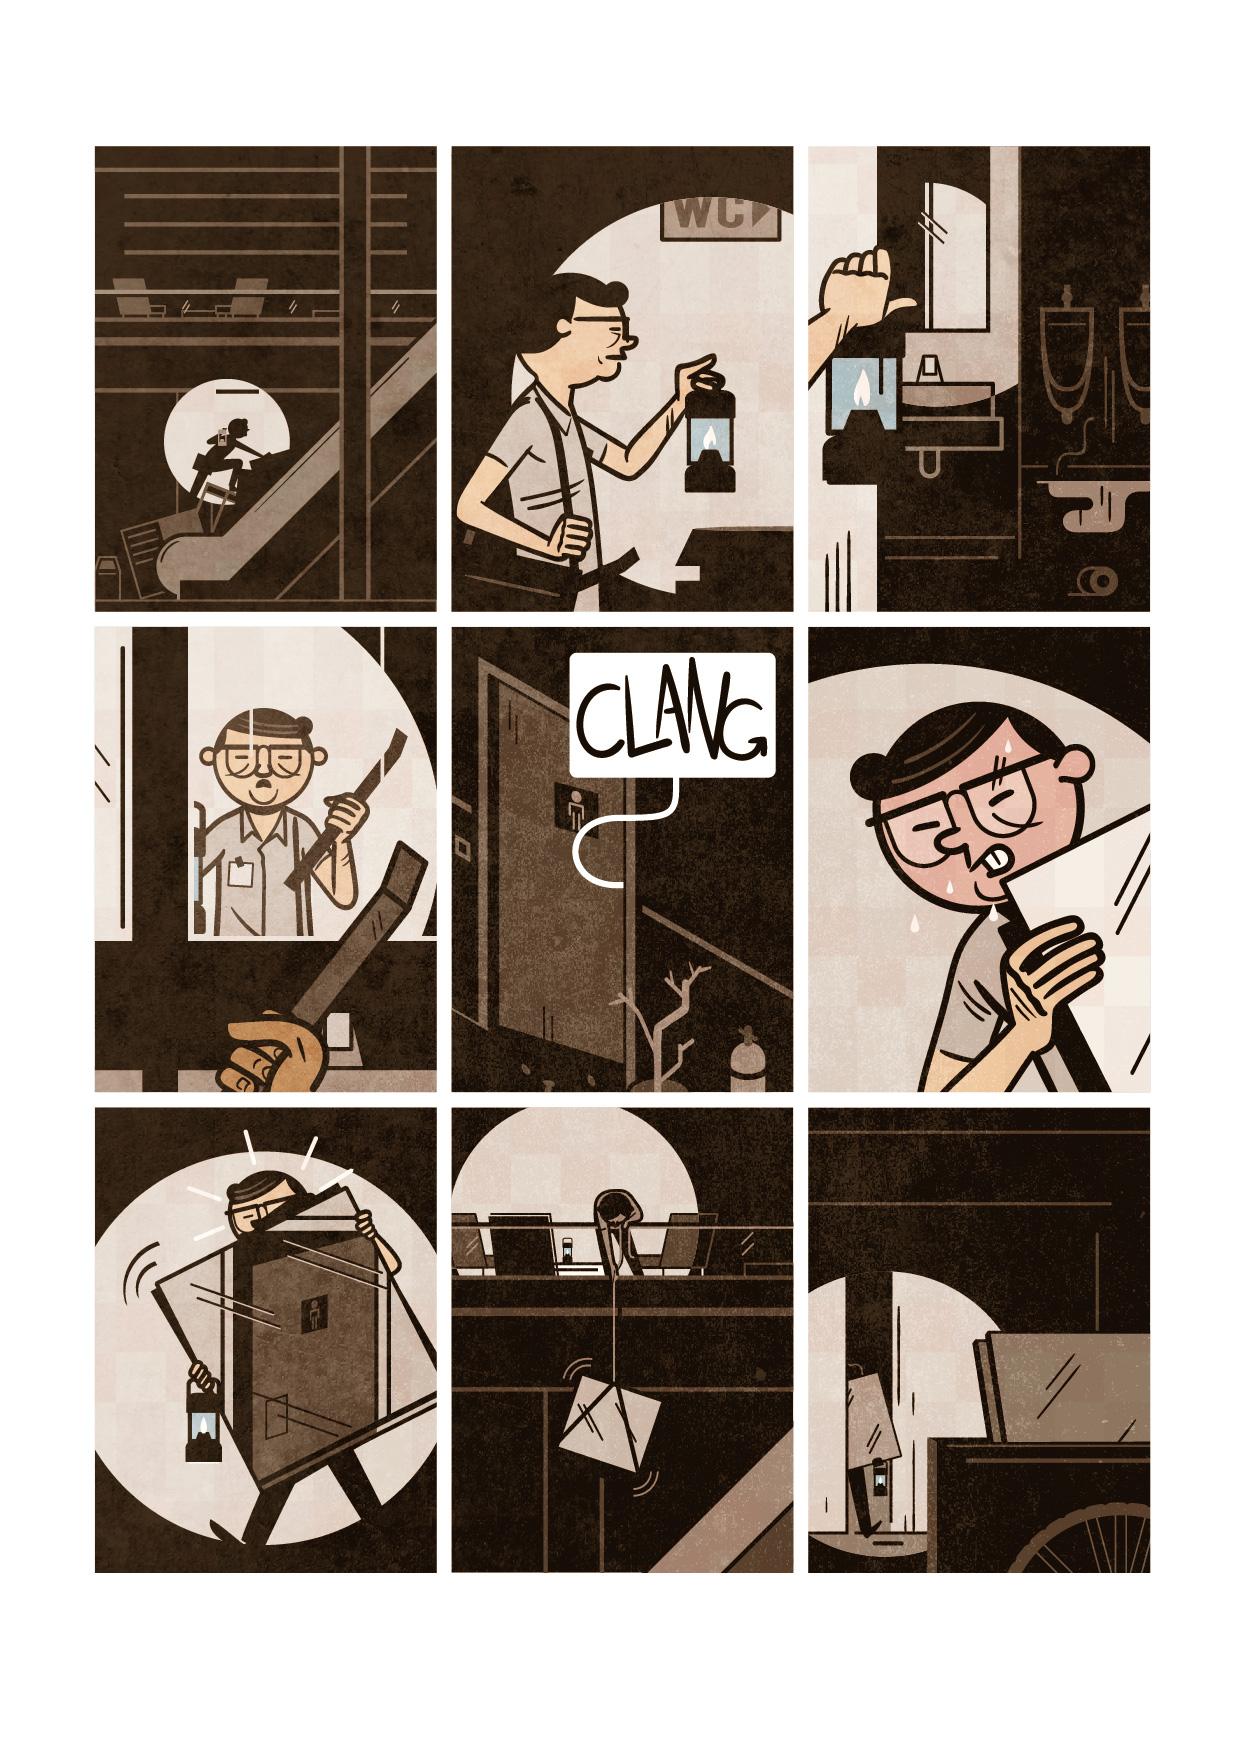 ZwartHoek page 16